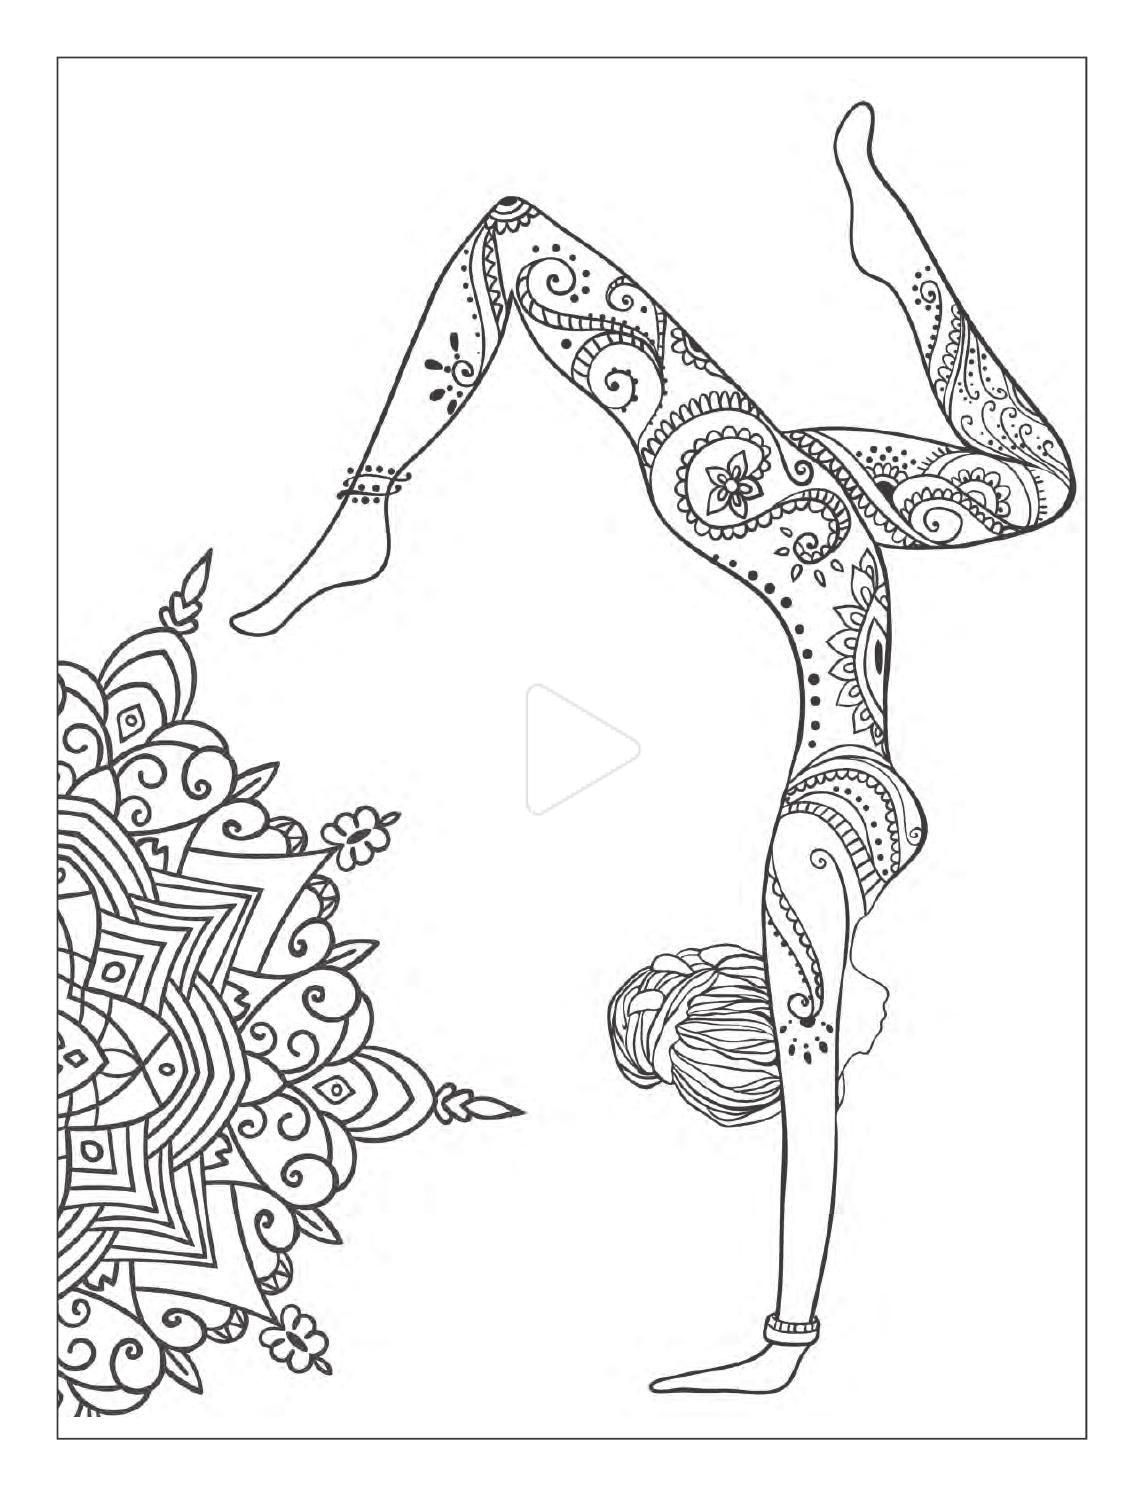 Yoga And Meditation Coloring Book For Adults With Yoga Poses And Mandalas Yoga Art Mandala Design Art Mandala Coloring [ 1496 x 1147 Pixel ]